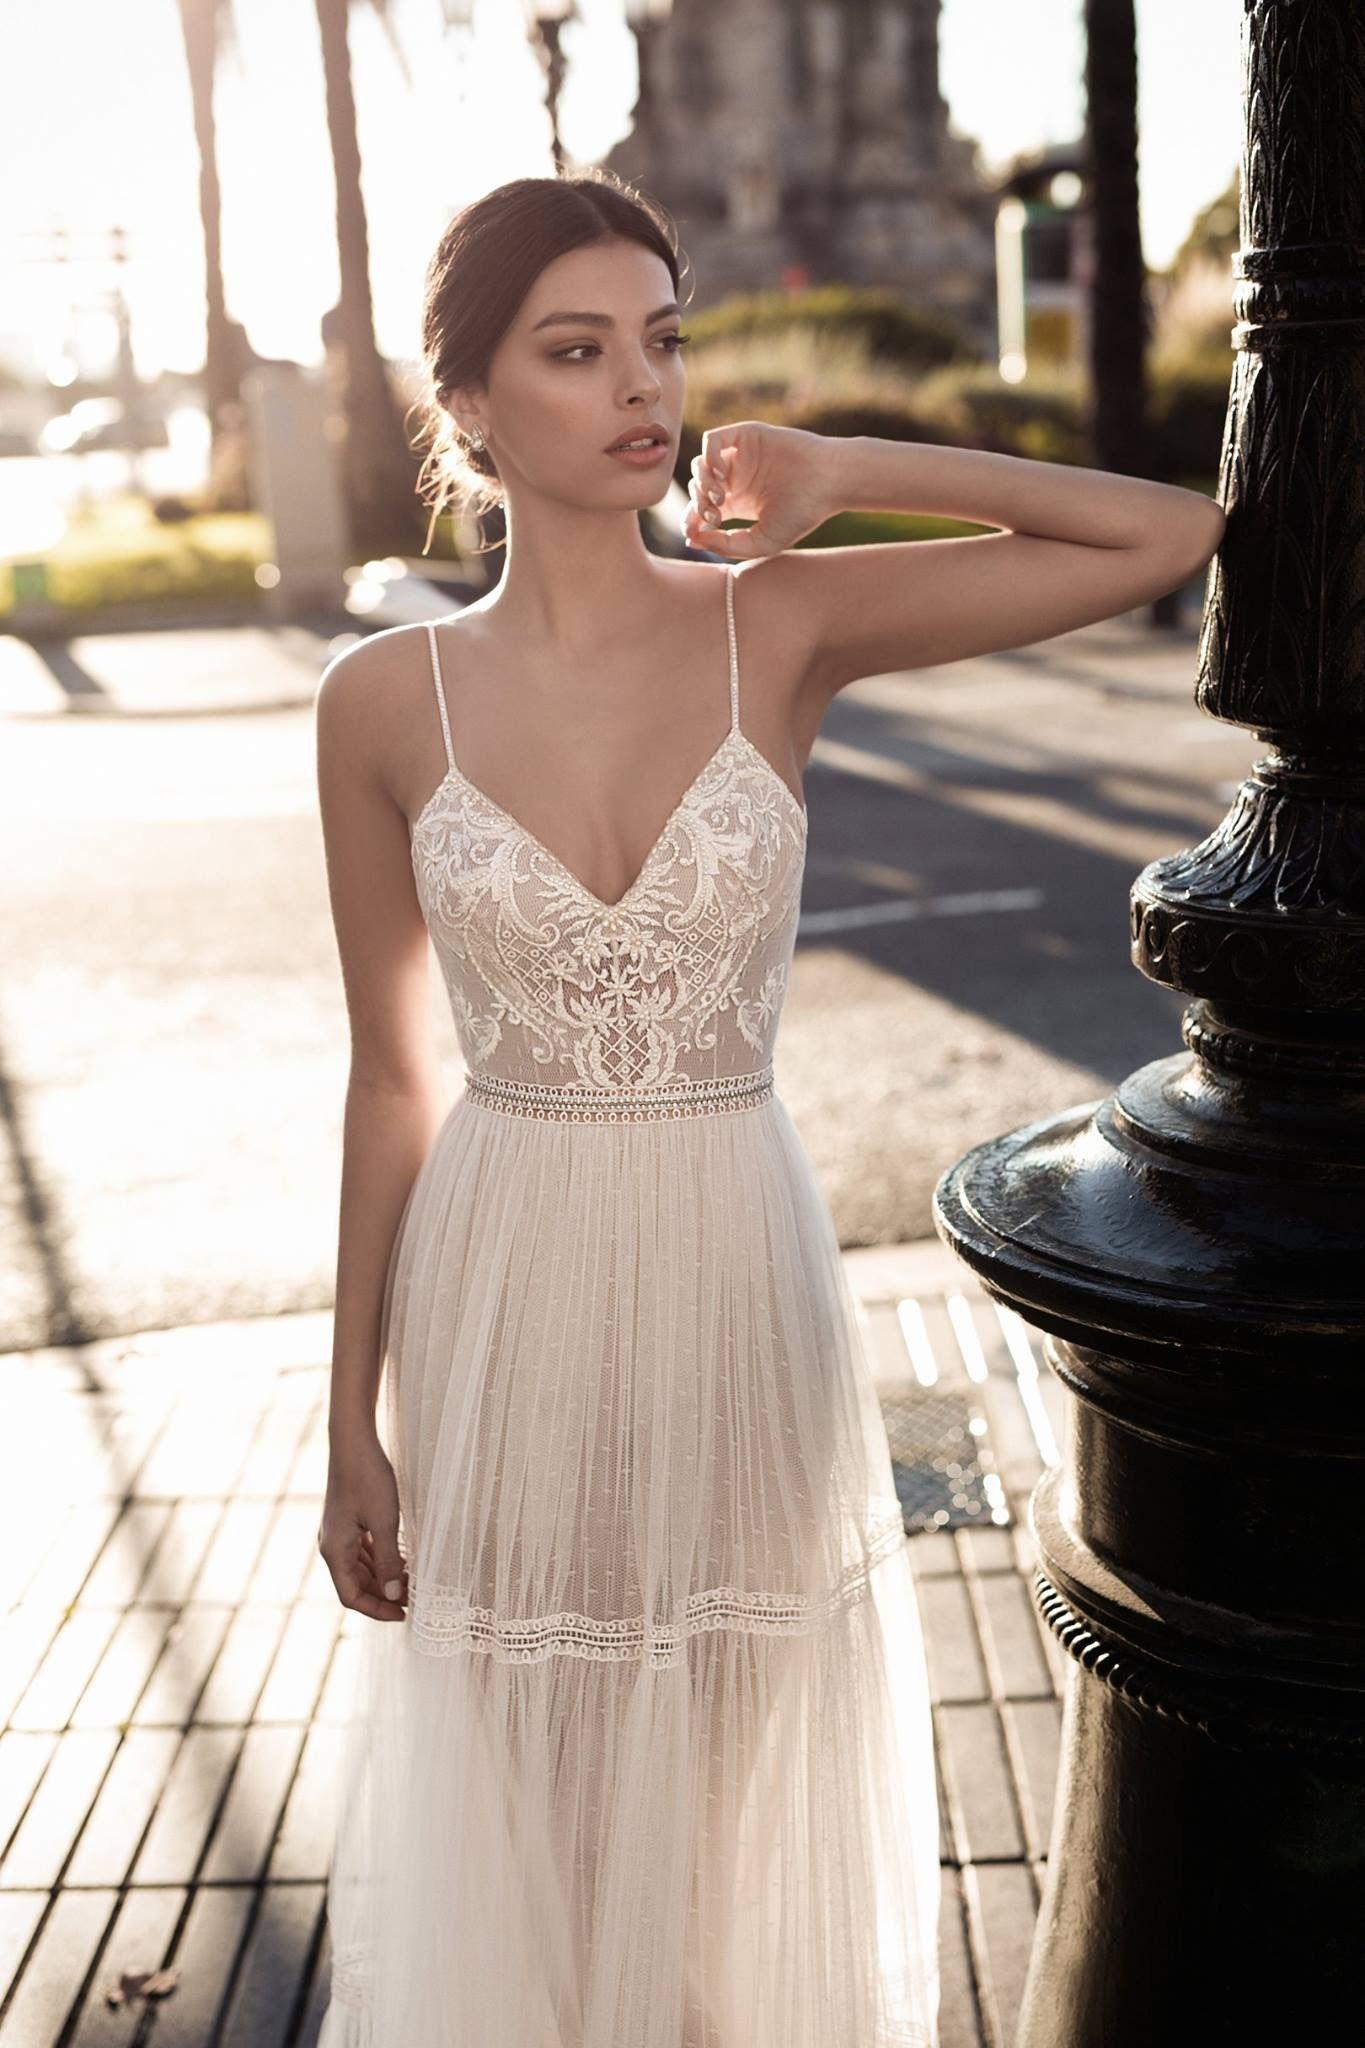 Pin by Adriana Tudor on Style | Pinterest | Wedding, Wedding dress ...